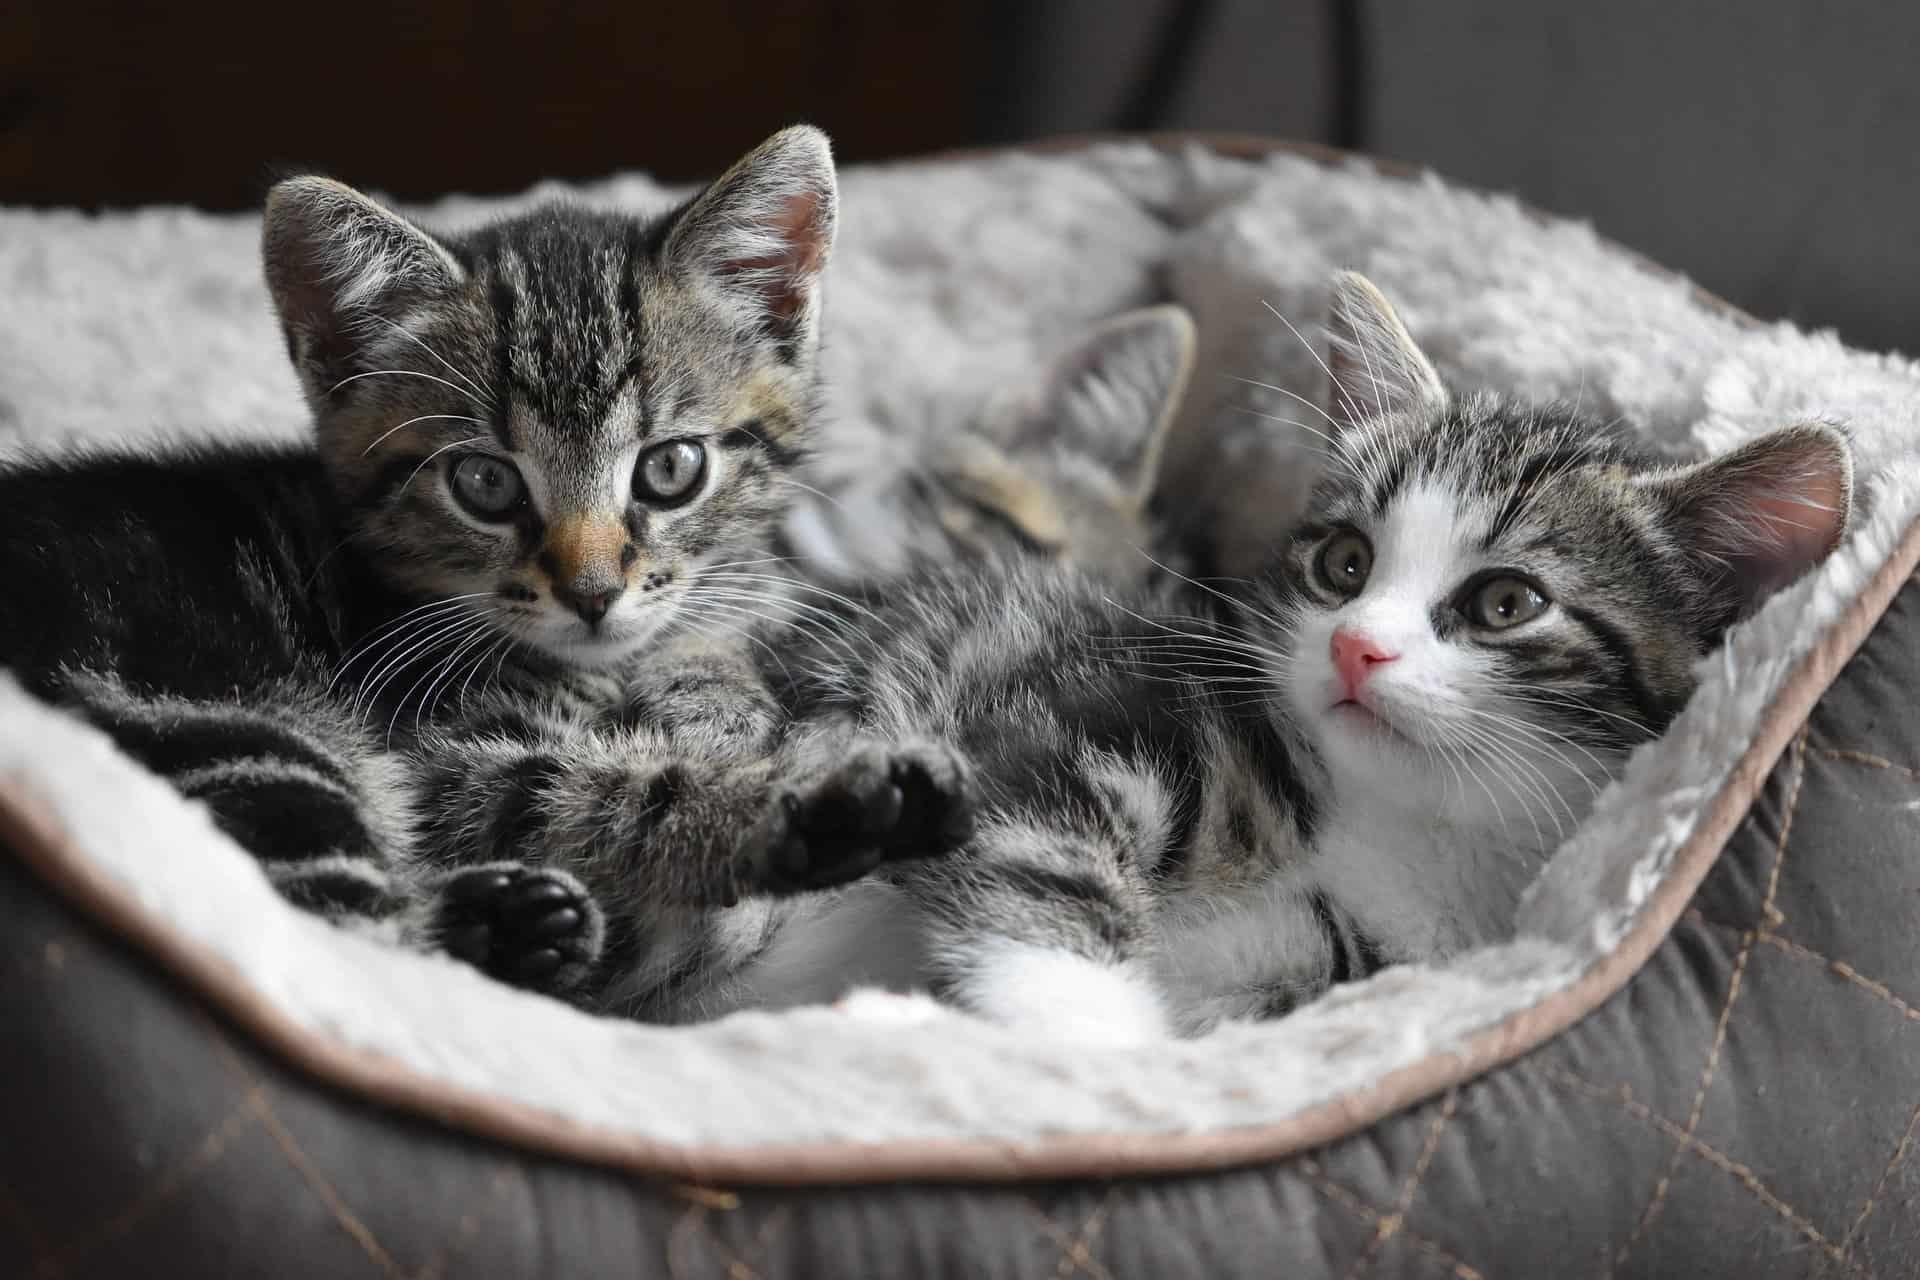 Top 20 Kitten Facts - Birth, Behavior, Development & More ...